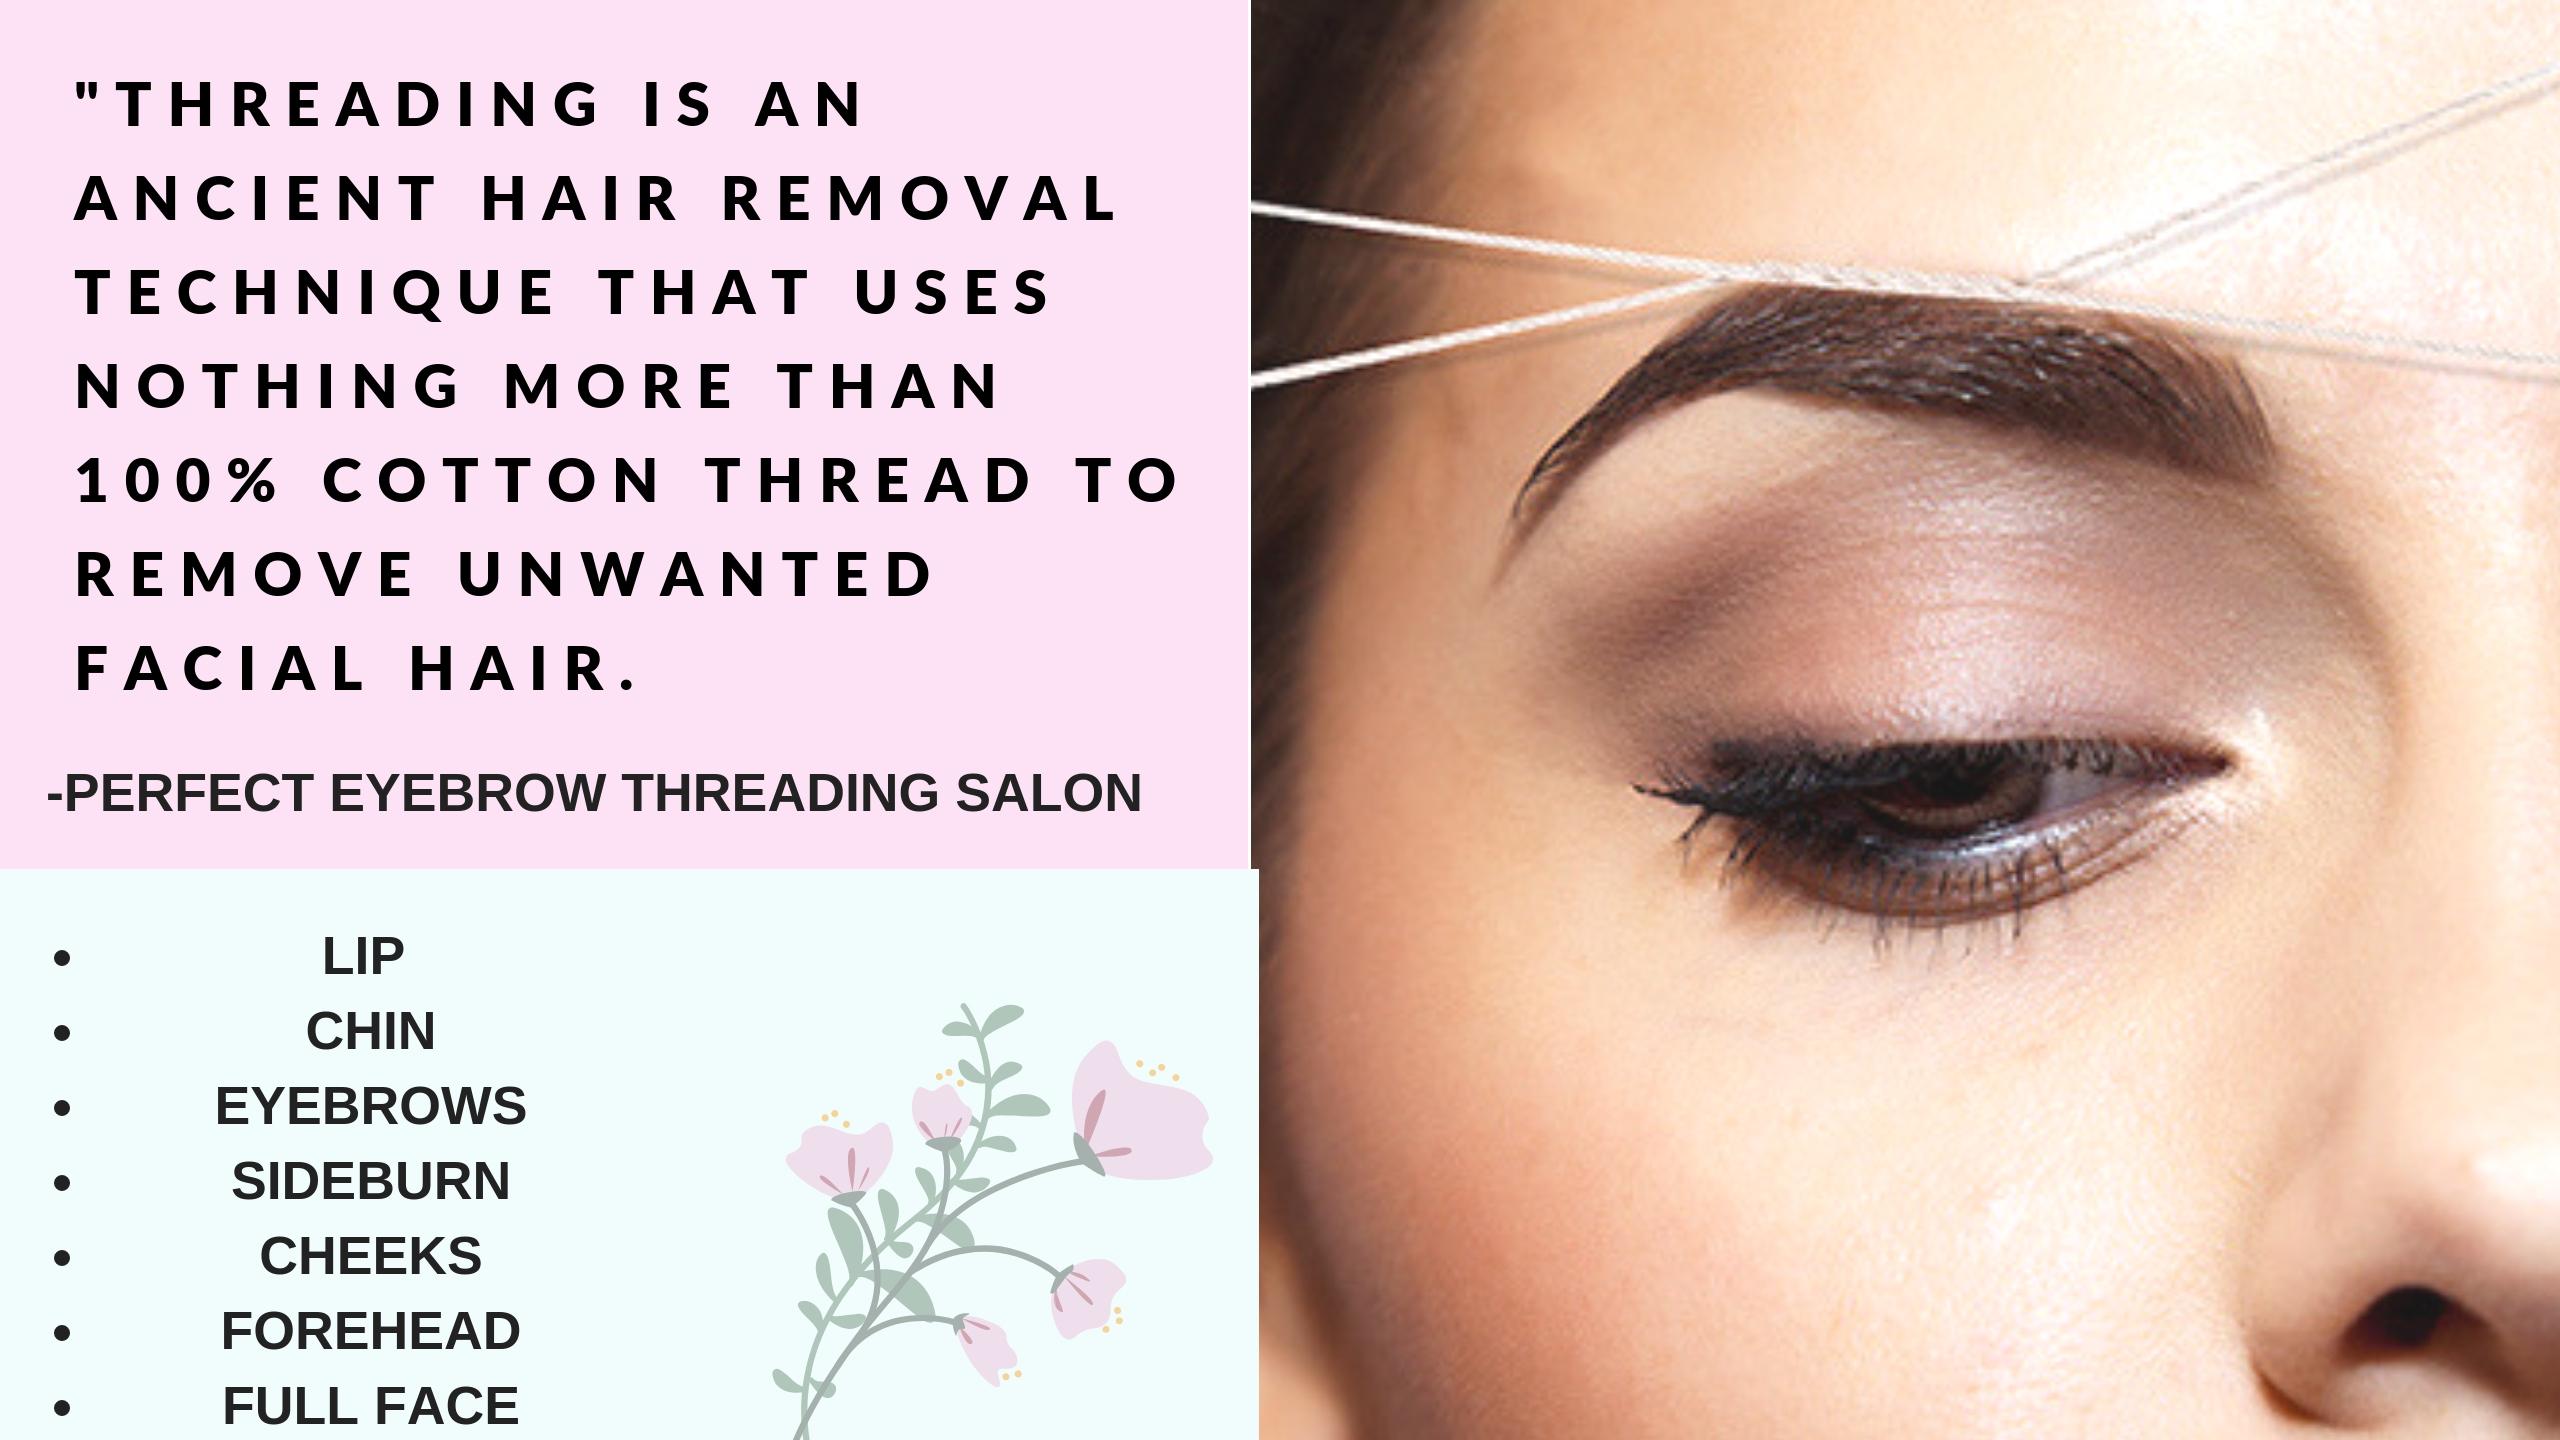 Perfect Eyebrow Threading Salon Threading Salon